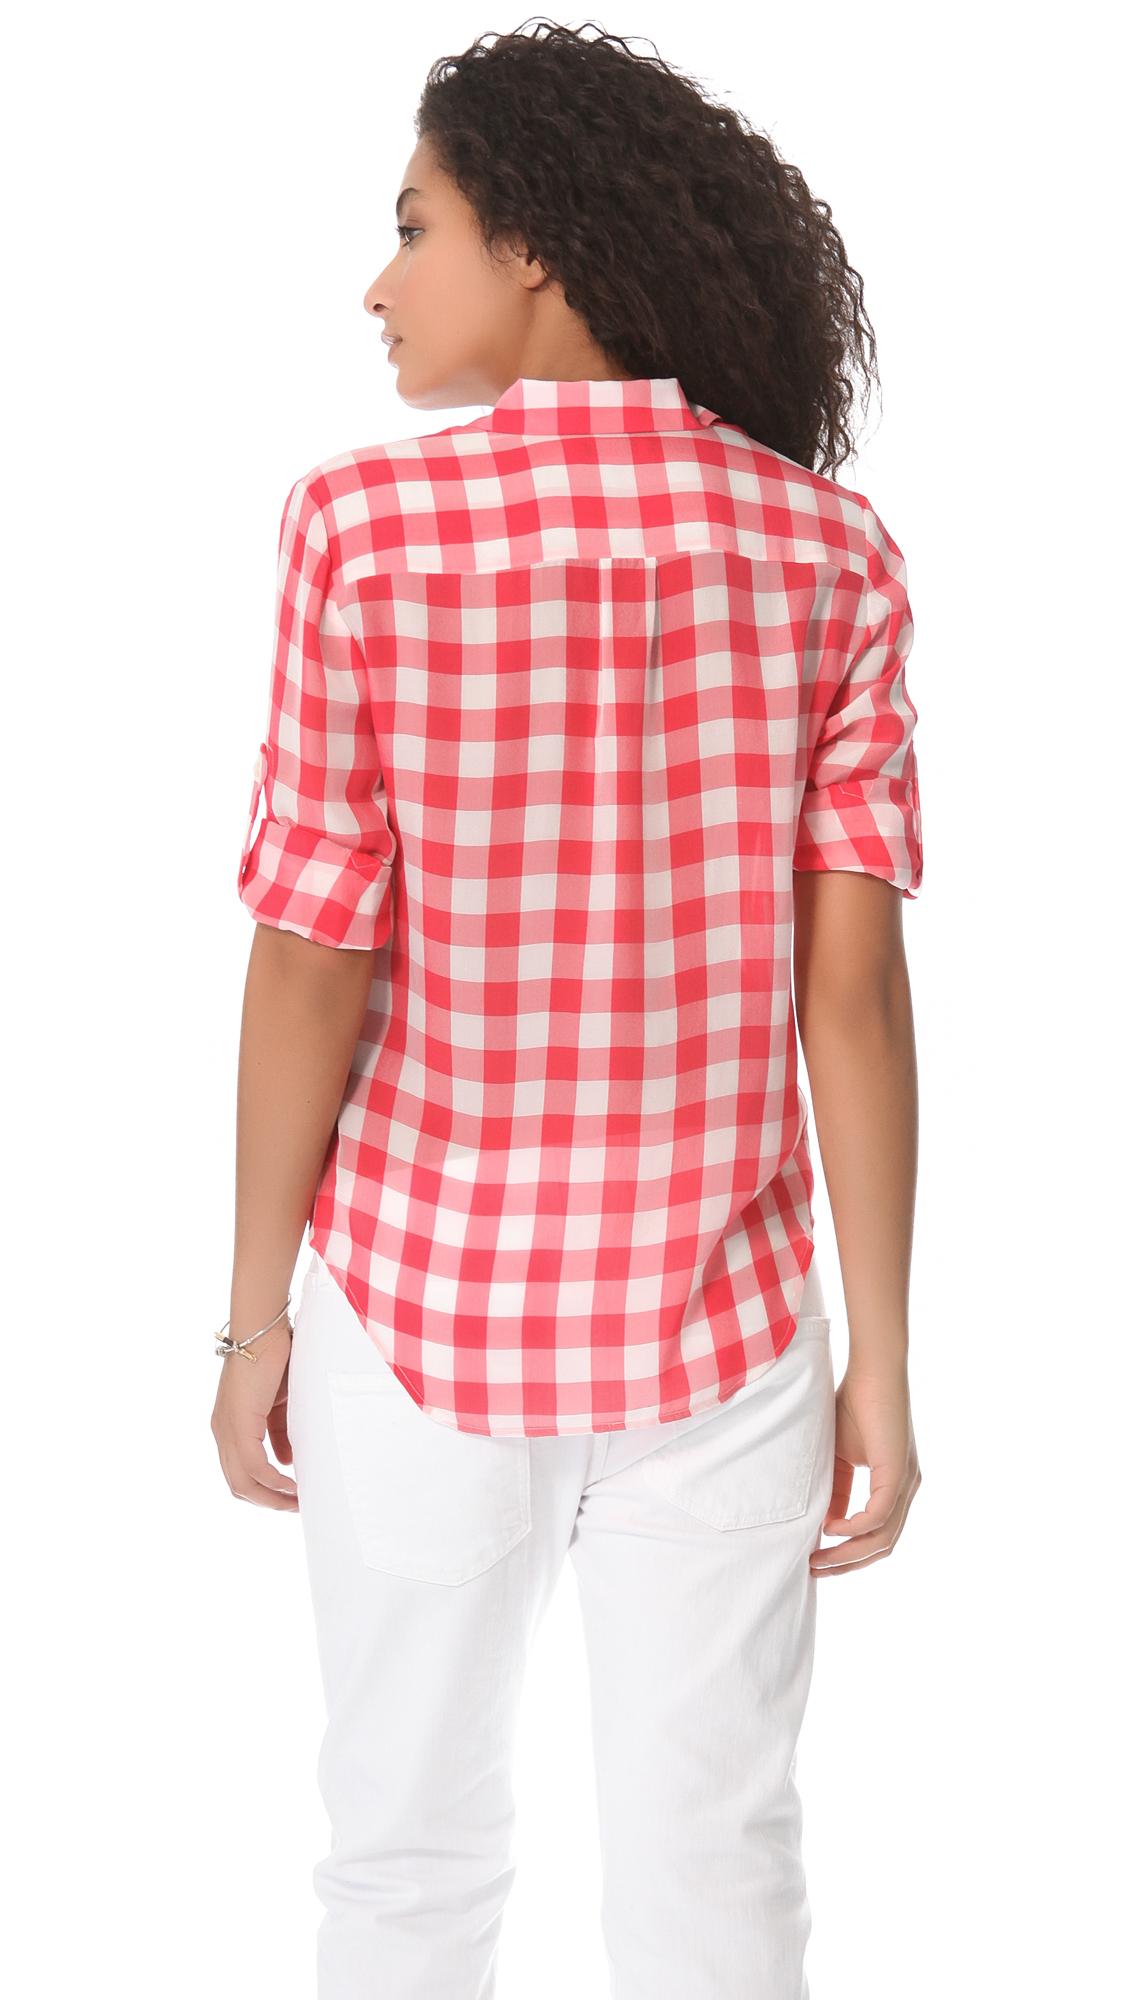 9f30e7b92dce74 Madewell Gingham Silk Boy Shirt